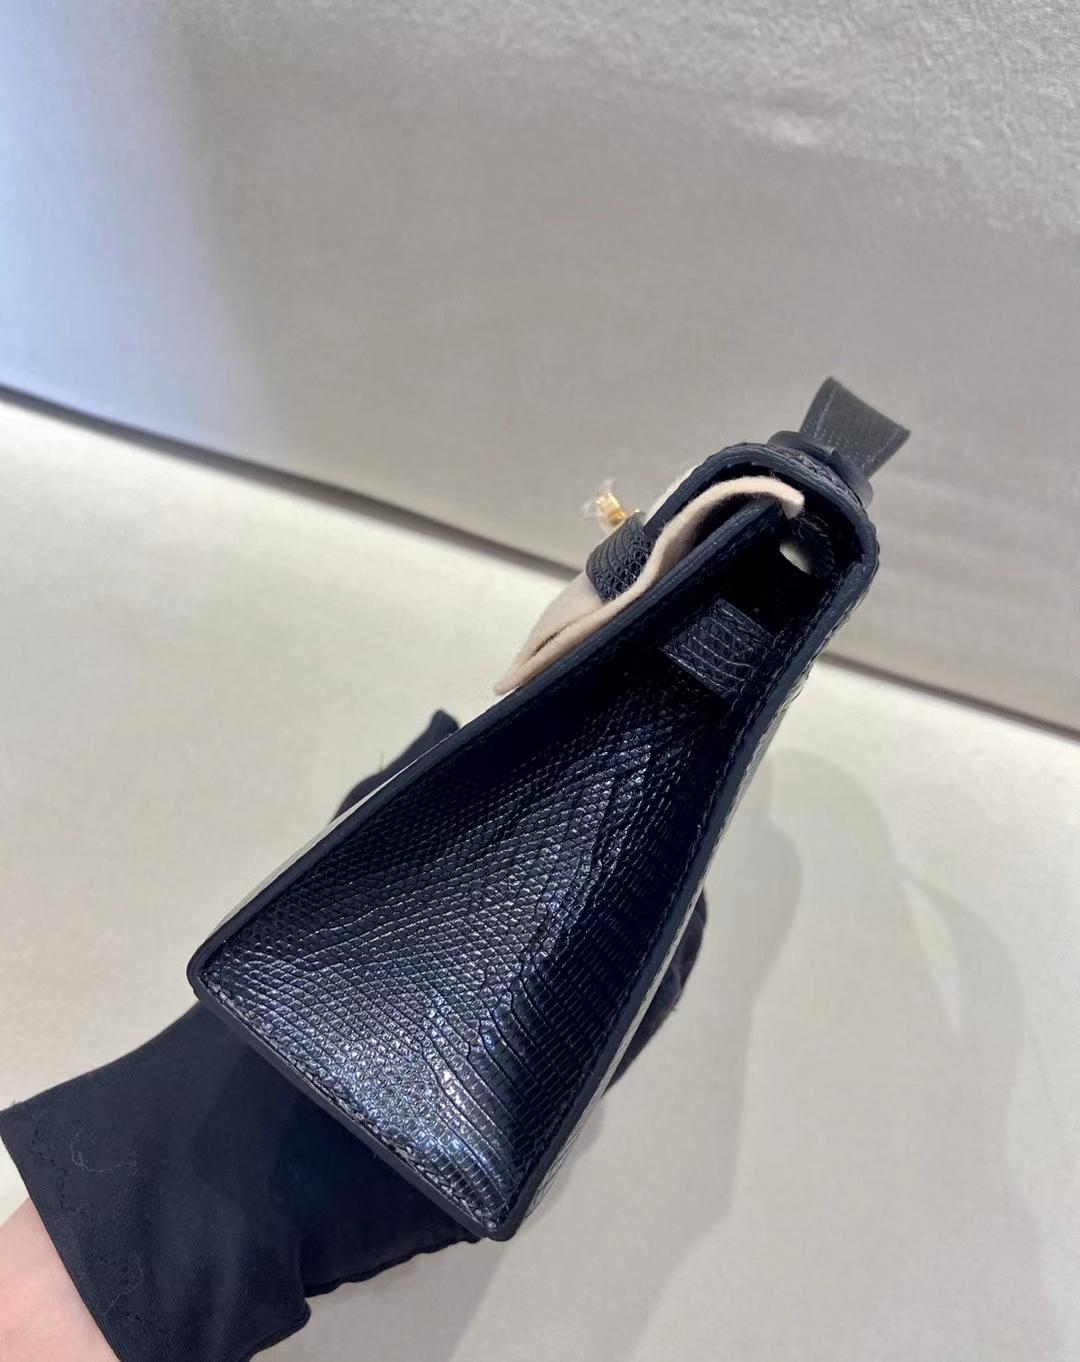 Hermès(爱马仕)miniKelly pochette 22cm  金扣 蜥蜴皮 黑色 顶级纯手工 现货